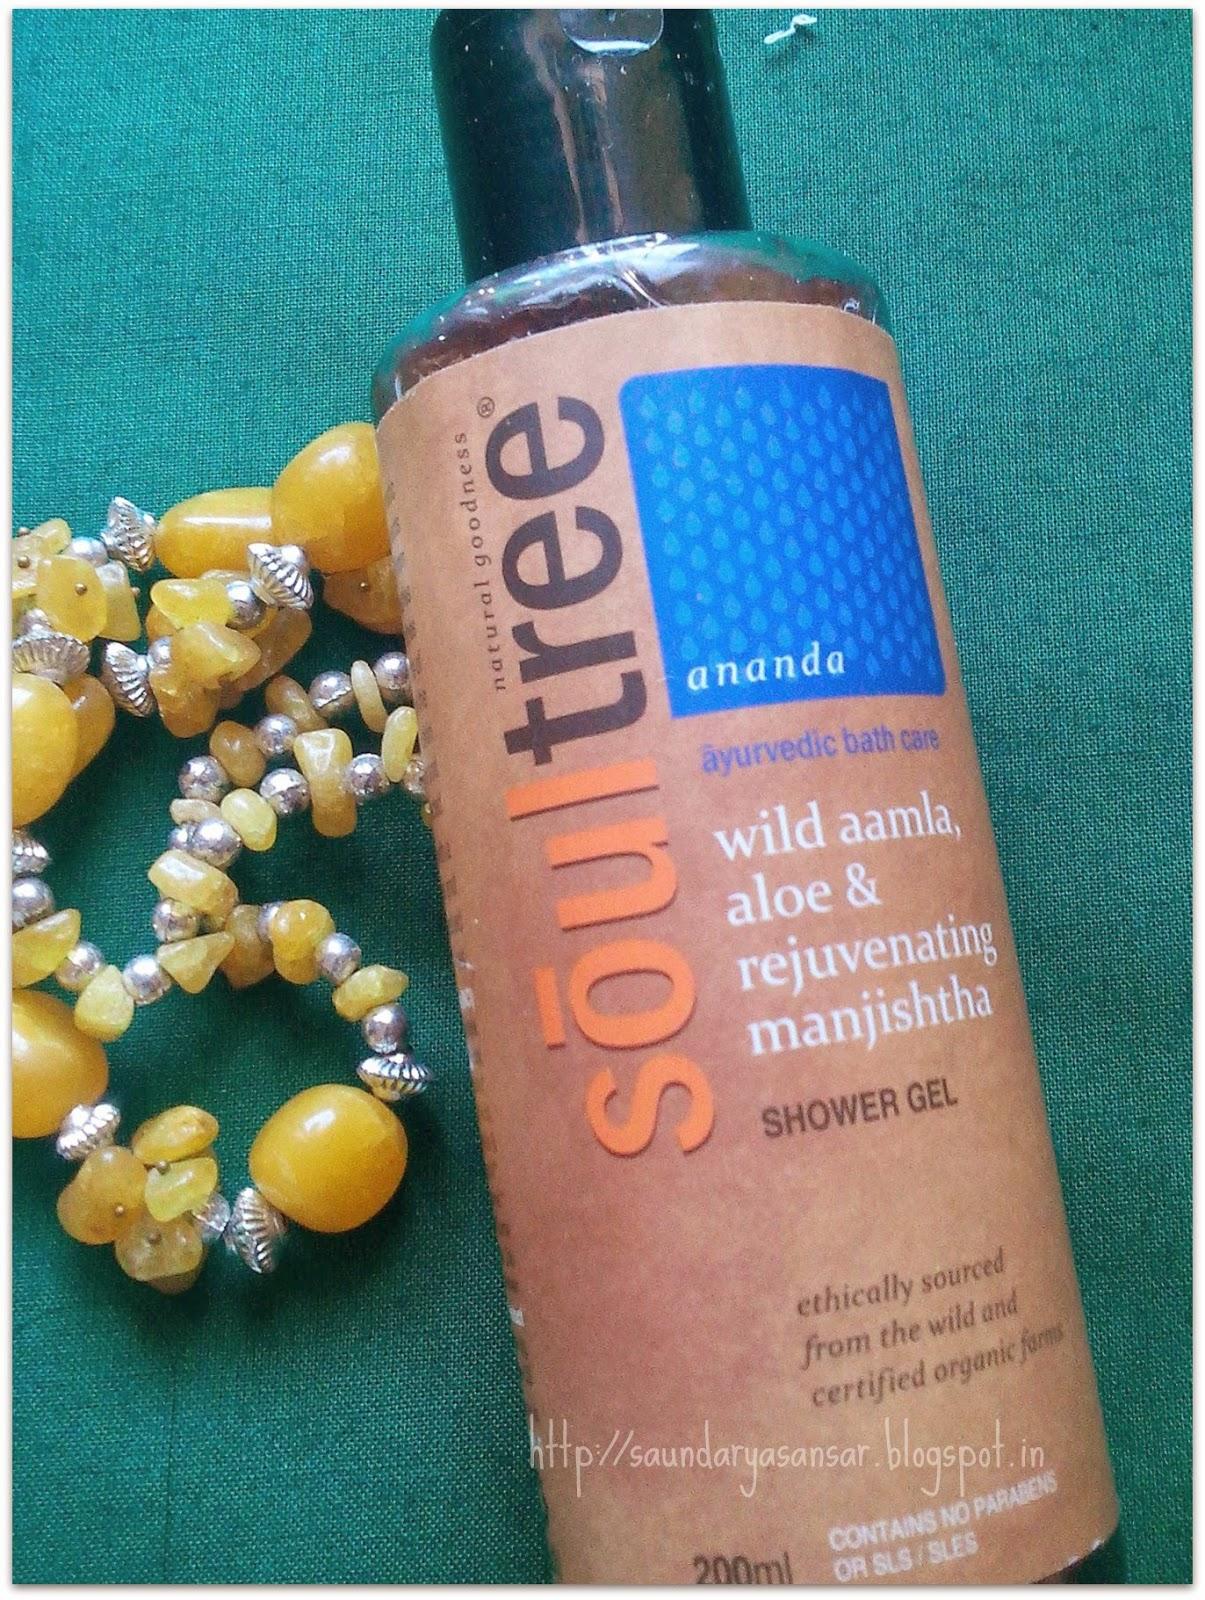 Soultree Wild Amla, Aloe & Rejuvenating manjishtha Shower Gel- Review